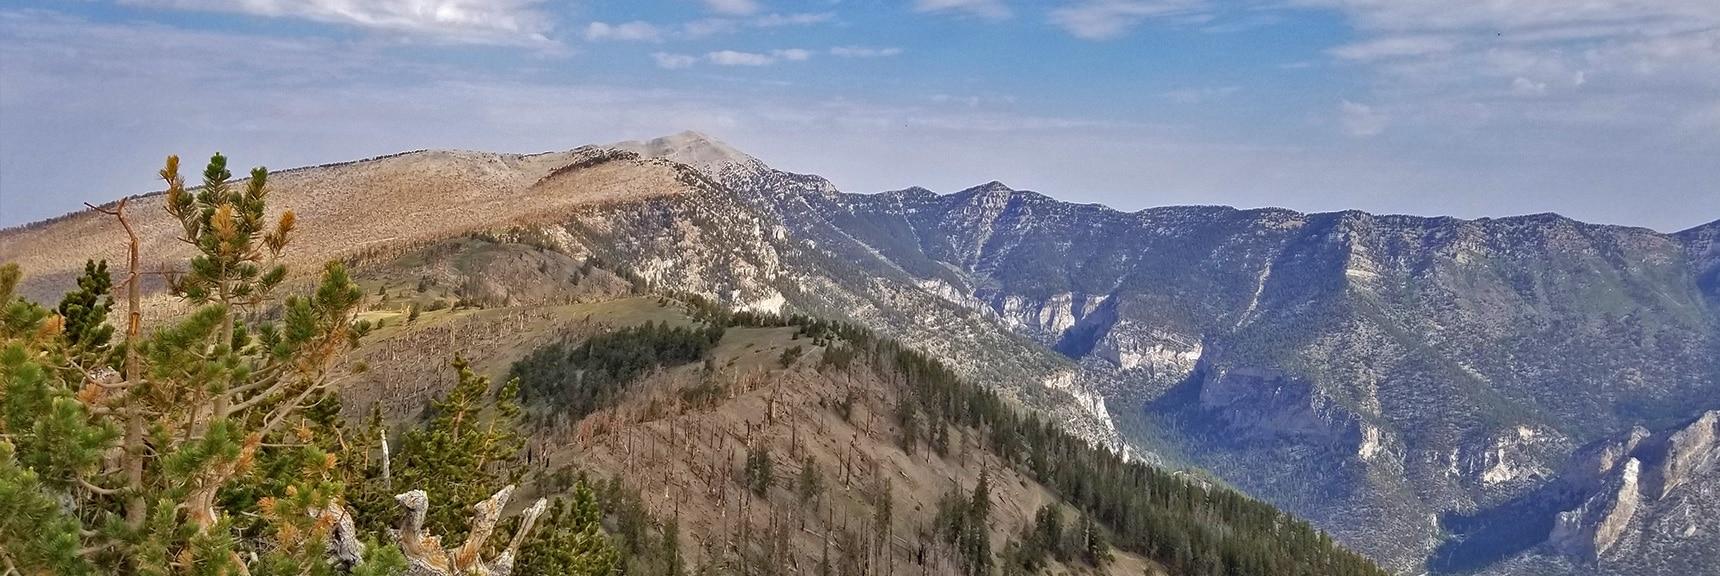 Charleston, Lee Peak and the Upper Loop Viewed from Griffith Peak Summit | Sexton Ridge Descent from Griffith Peak, Mt. Charleston Wilderness, Spring Mountains, Nevada